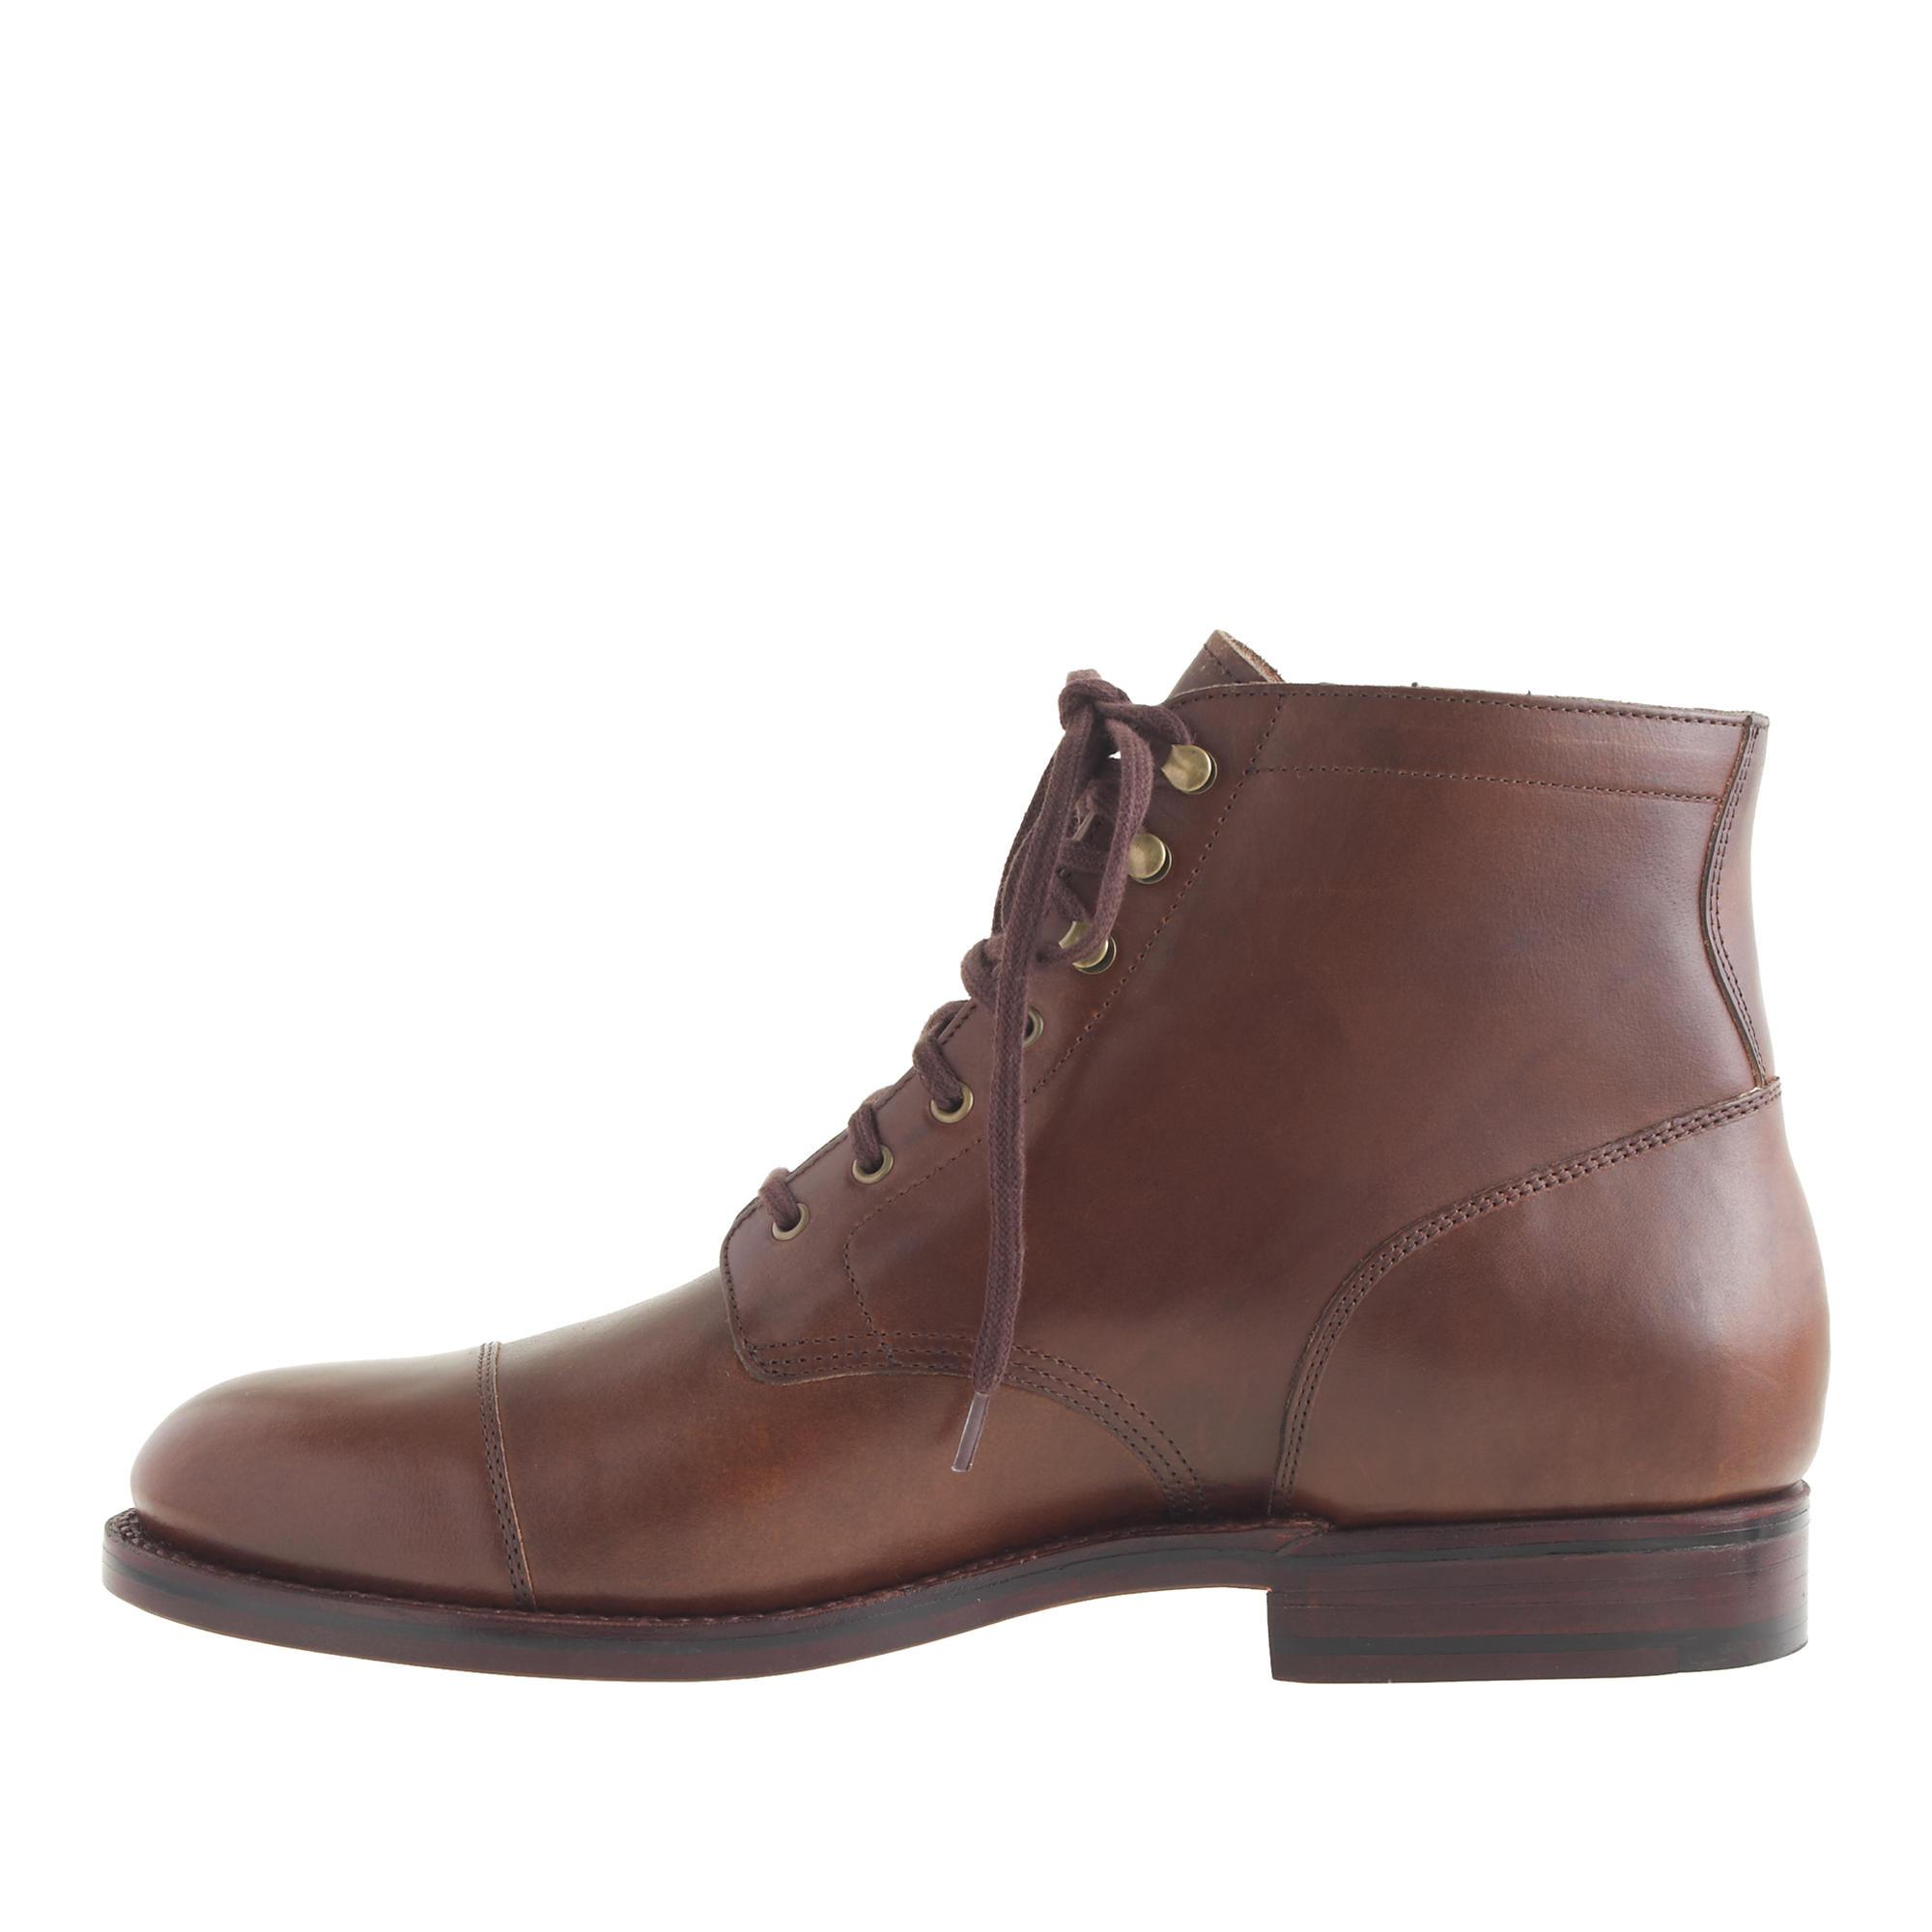 j crew ludlow cap toe boots in brown for brown